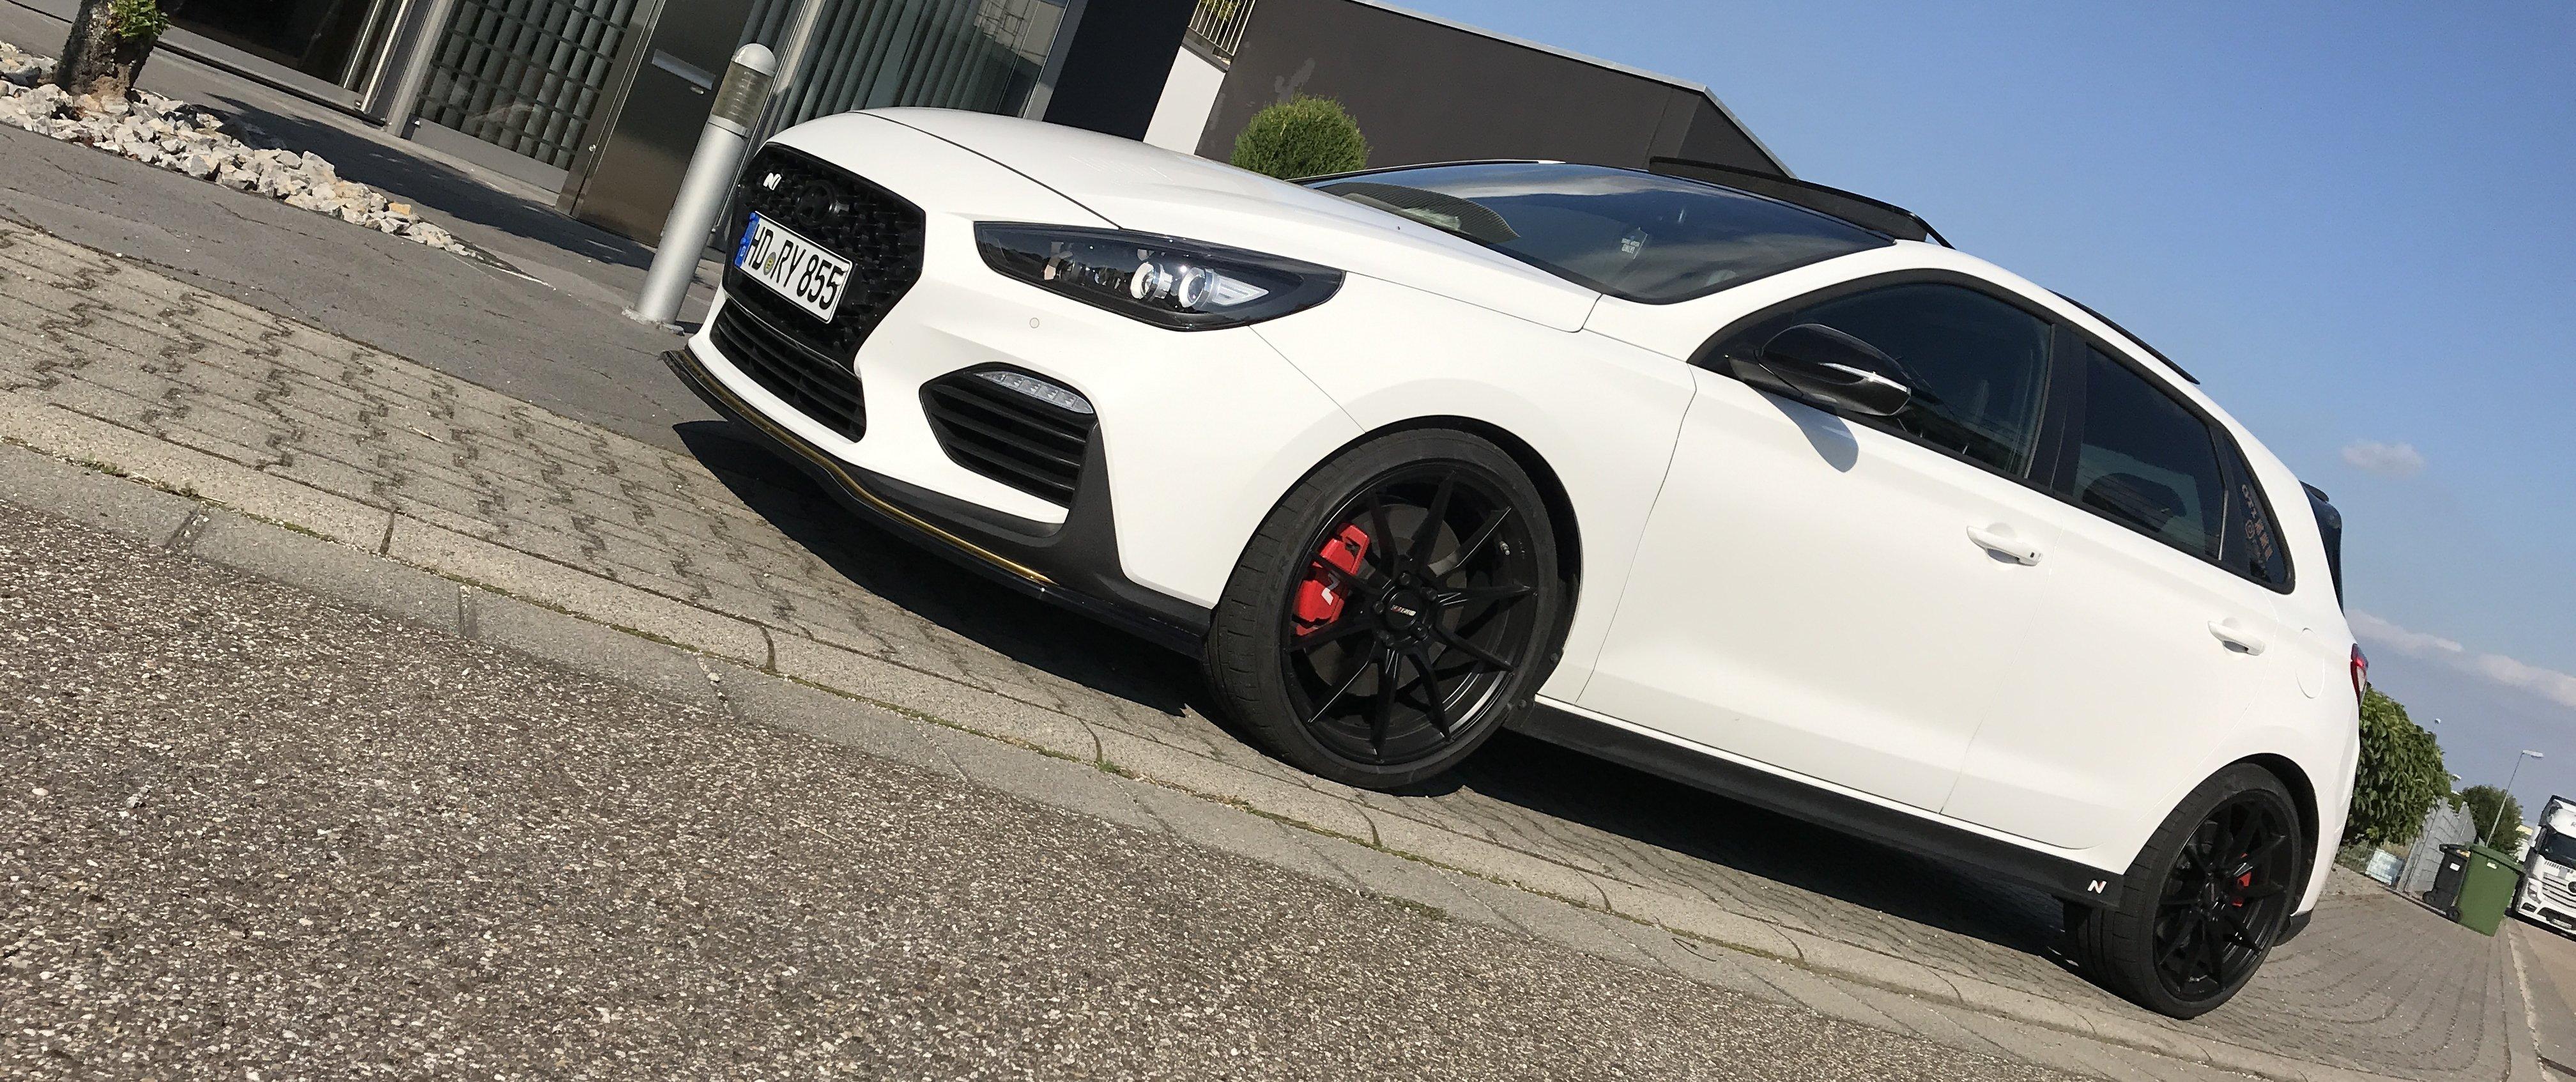 Hyundai – i30 – Weiß – MOTEC – Ultralight – Schwarz – 19 Zoll